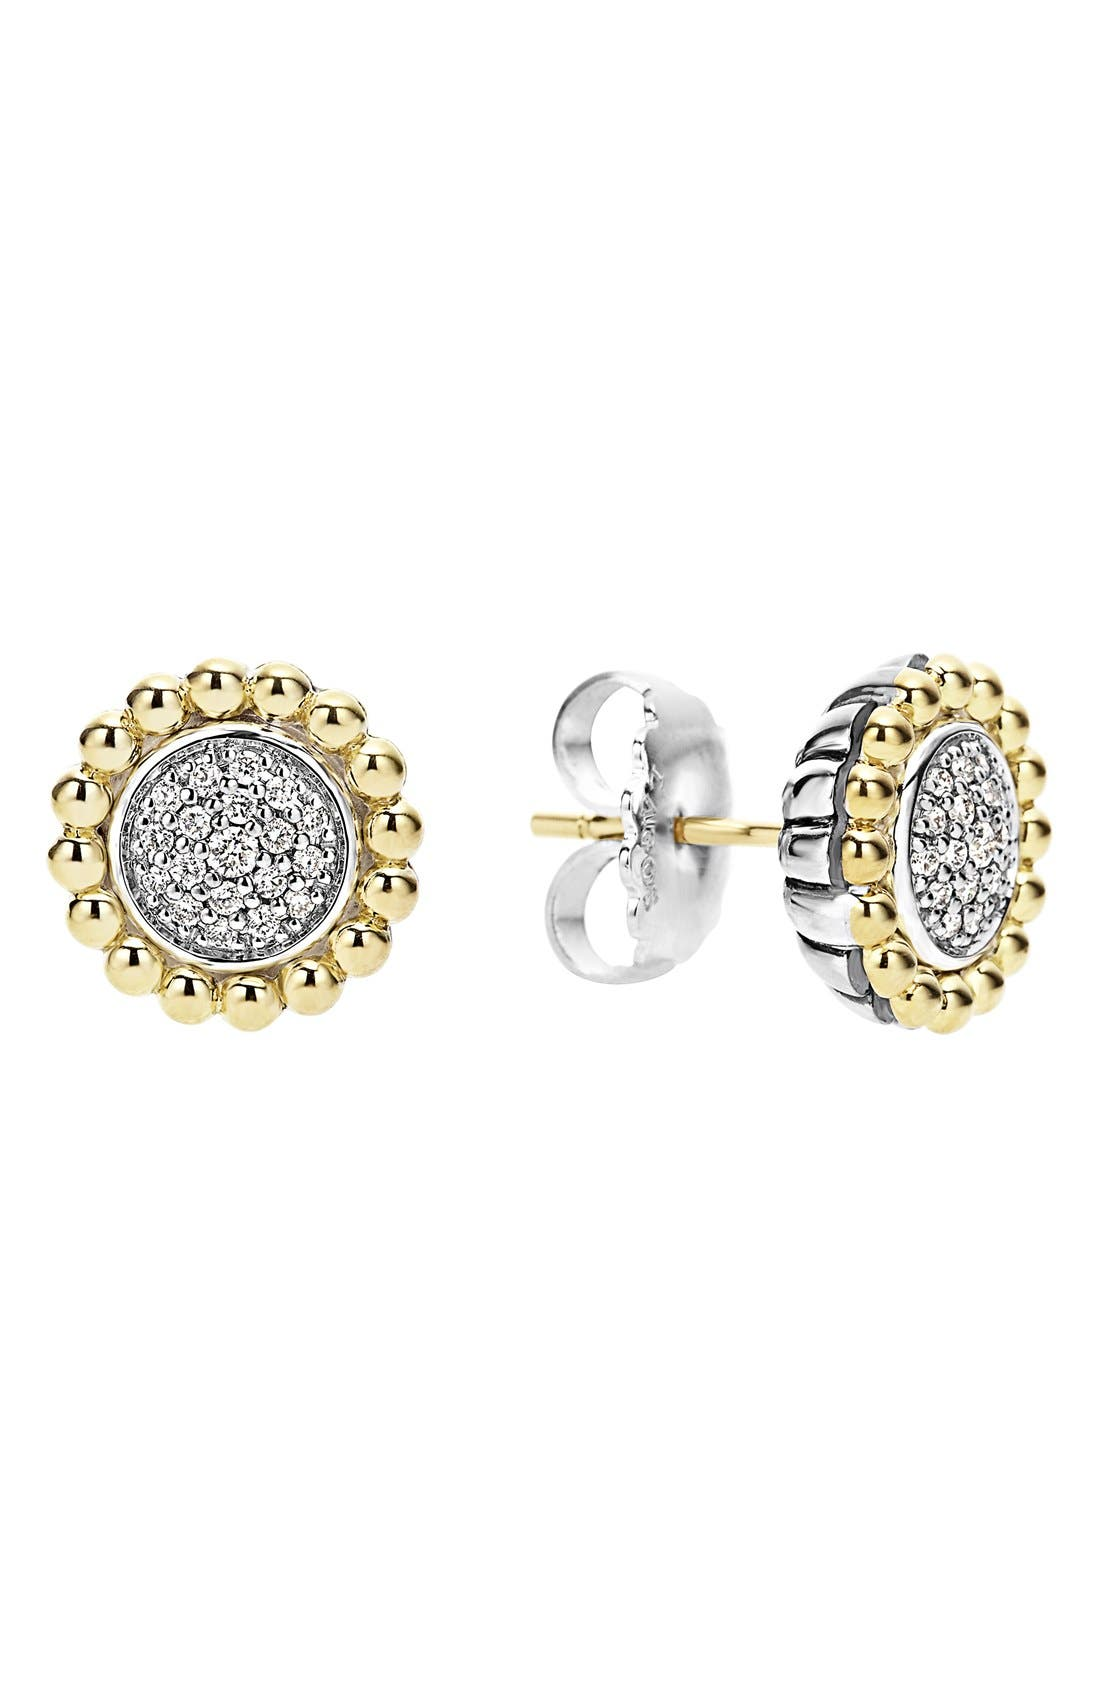 Diamond Caviar Stud Earrings,                         Main,                         color, SILVER/ GOLD